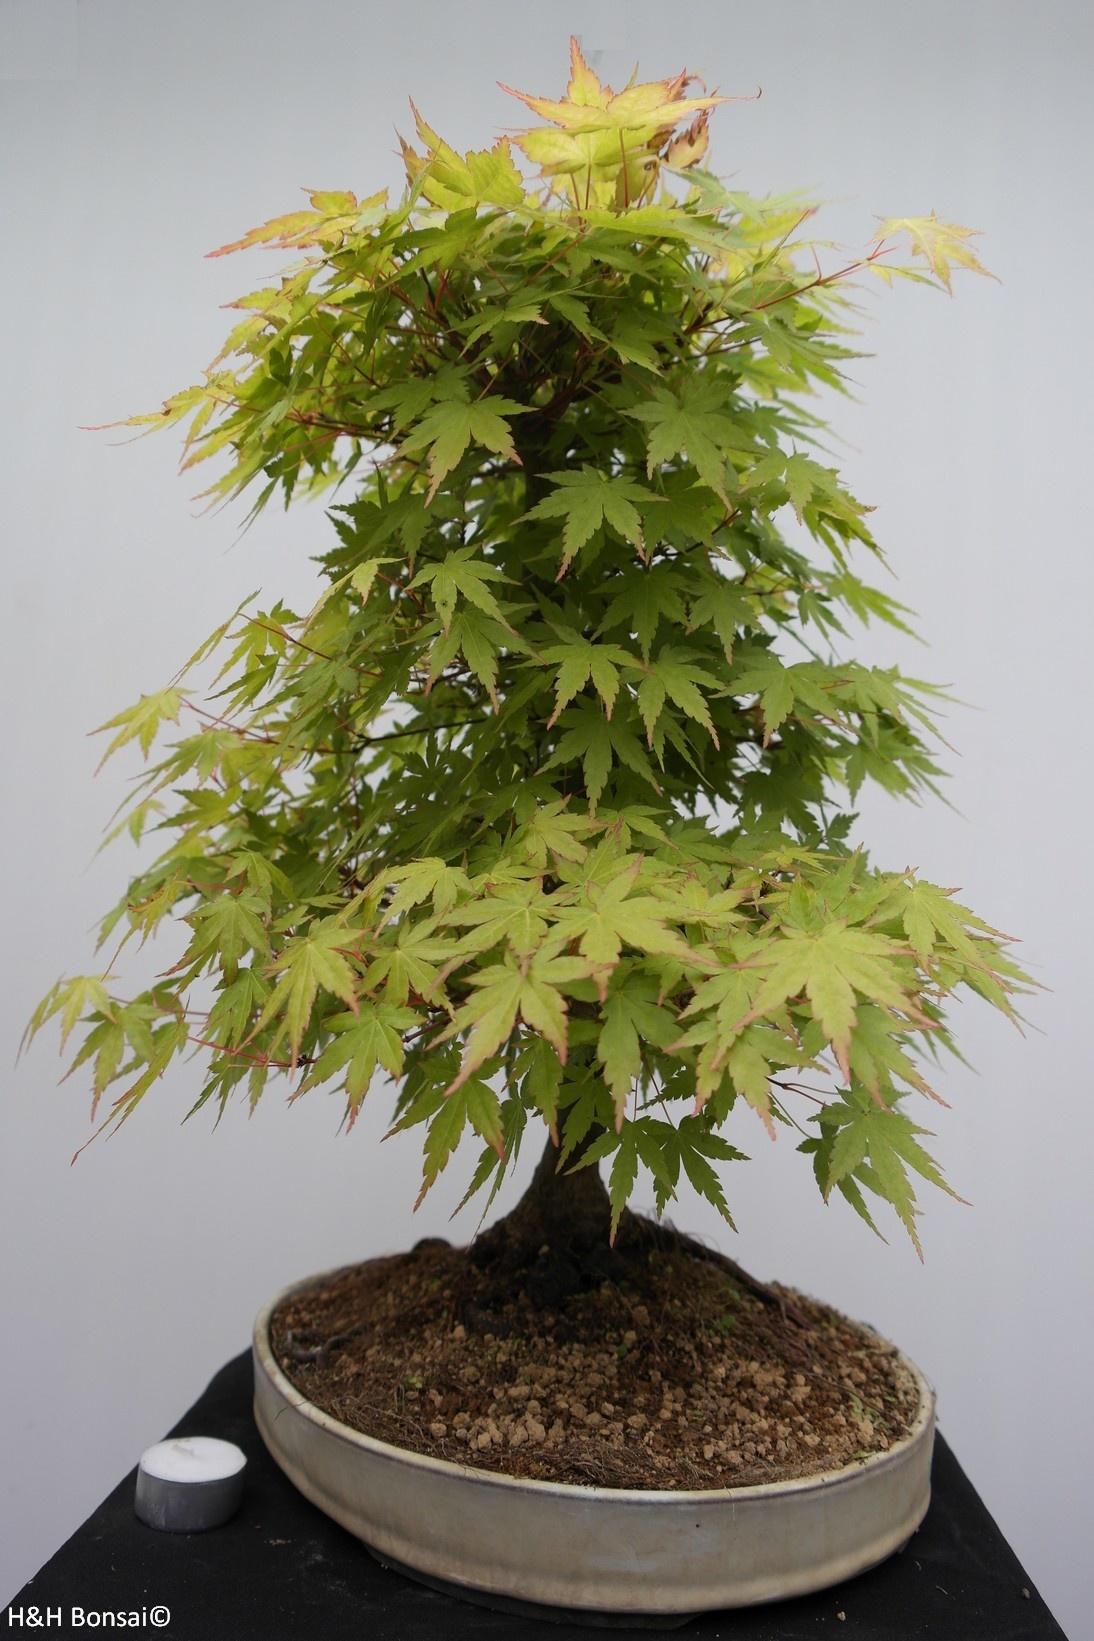 Bonsai Jap. Fächerahorn, Acer palmatum, nr. 7764